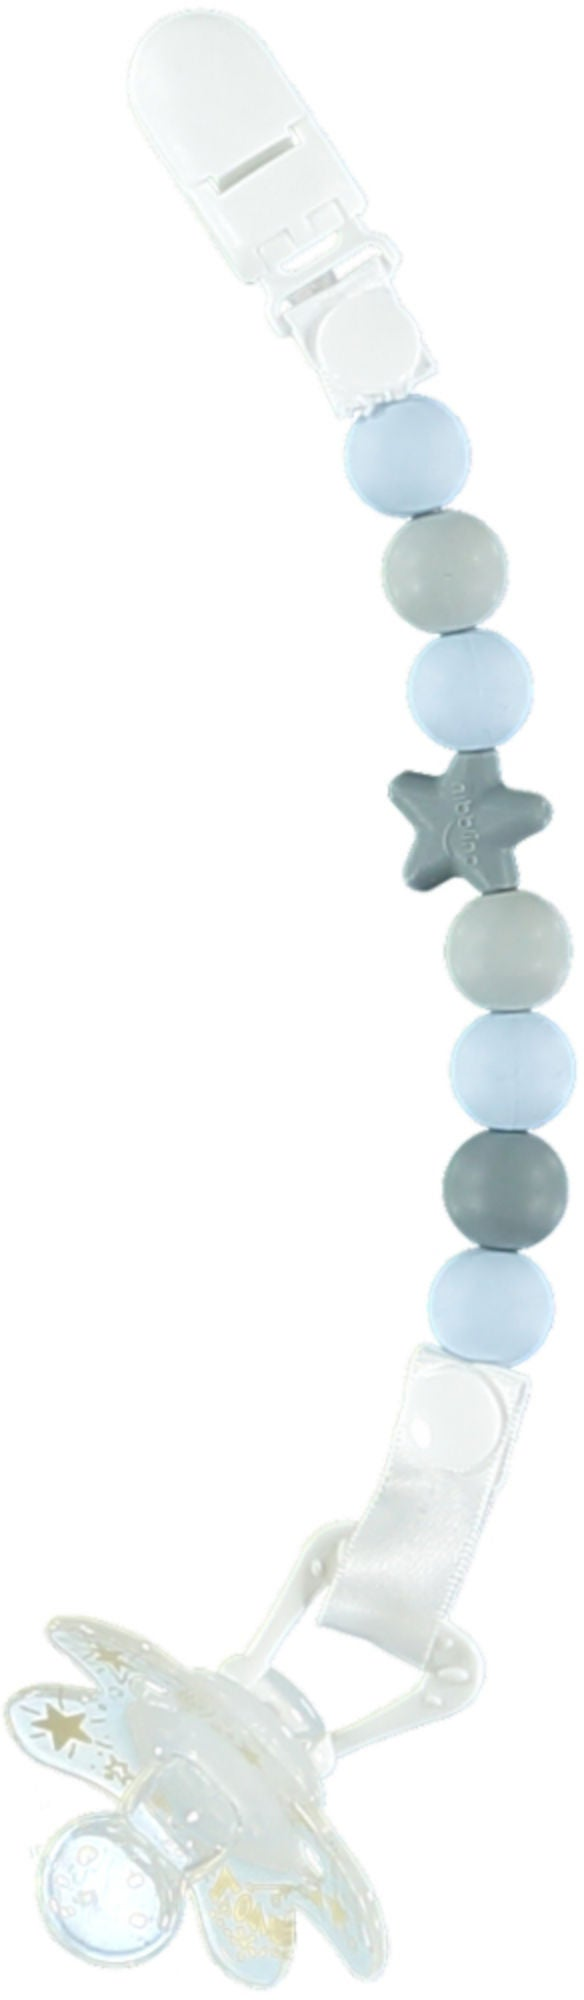 Nibbling Comet Napphållare med Adapter, Baby Blue/Grey